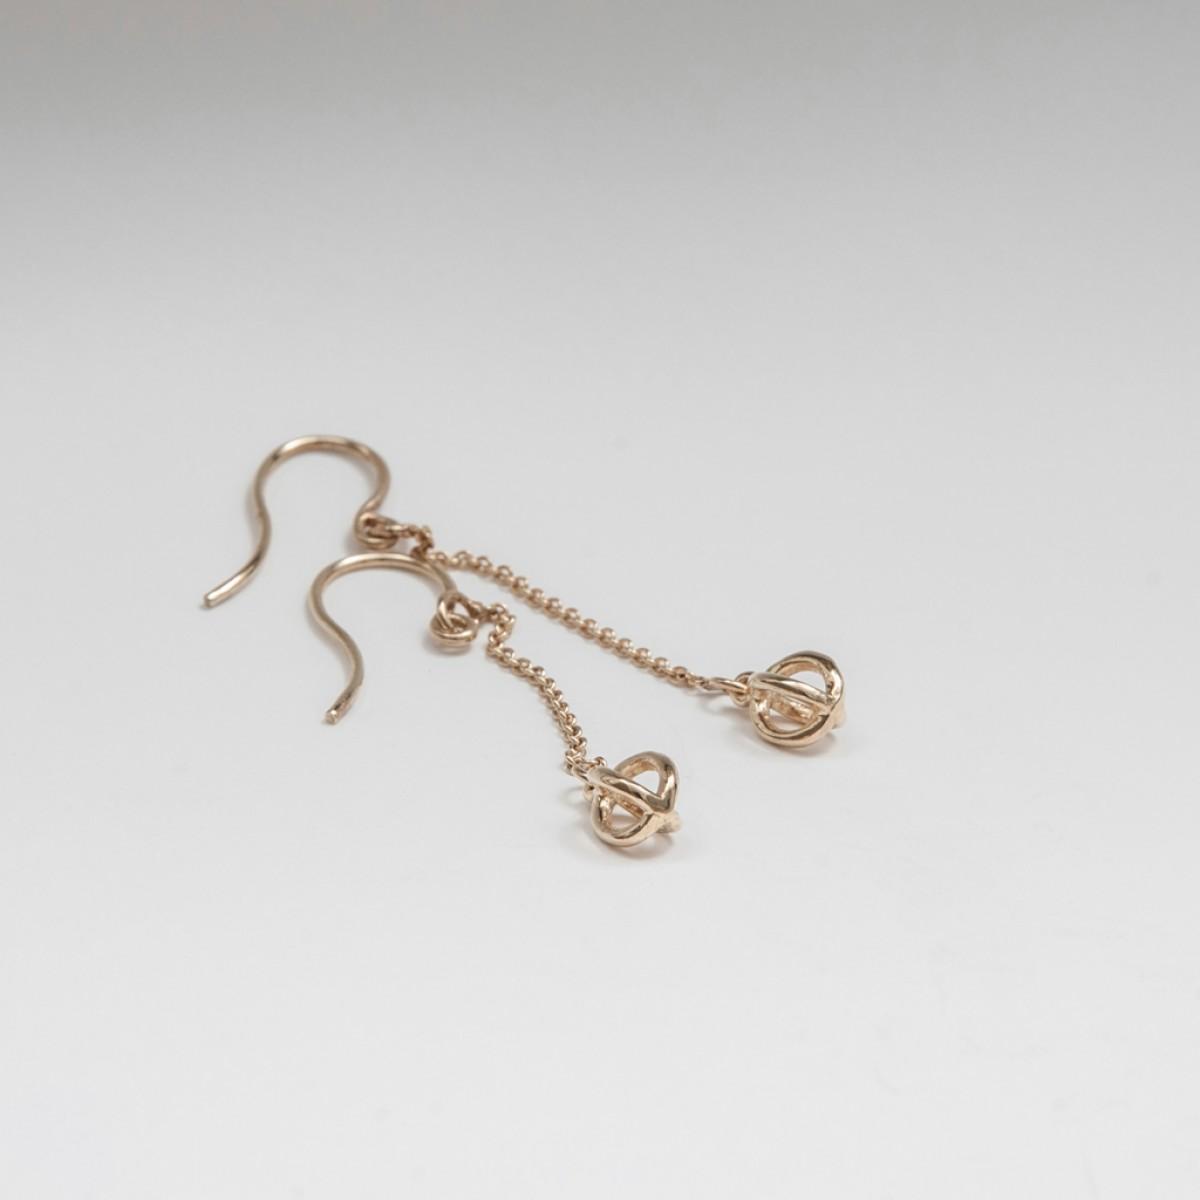 Jonathan Radetz Jewellery, Ohrringe KISSKISS, Gold 375